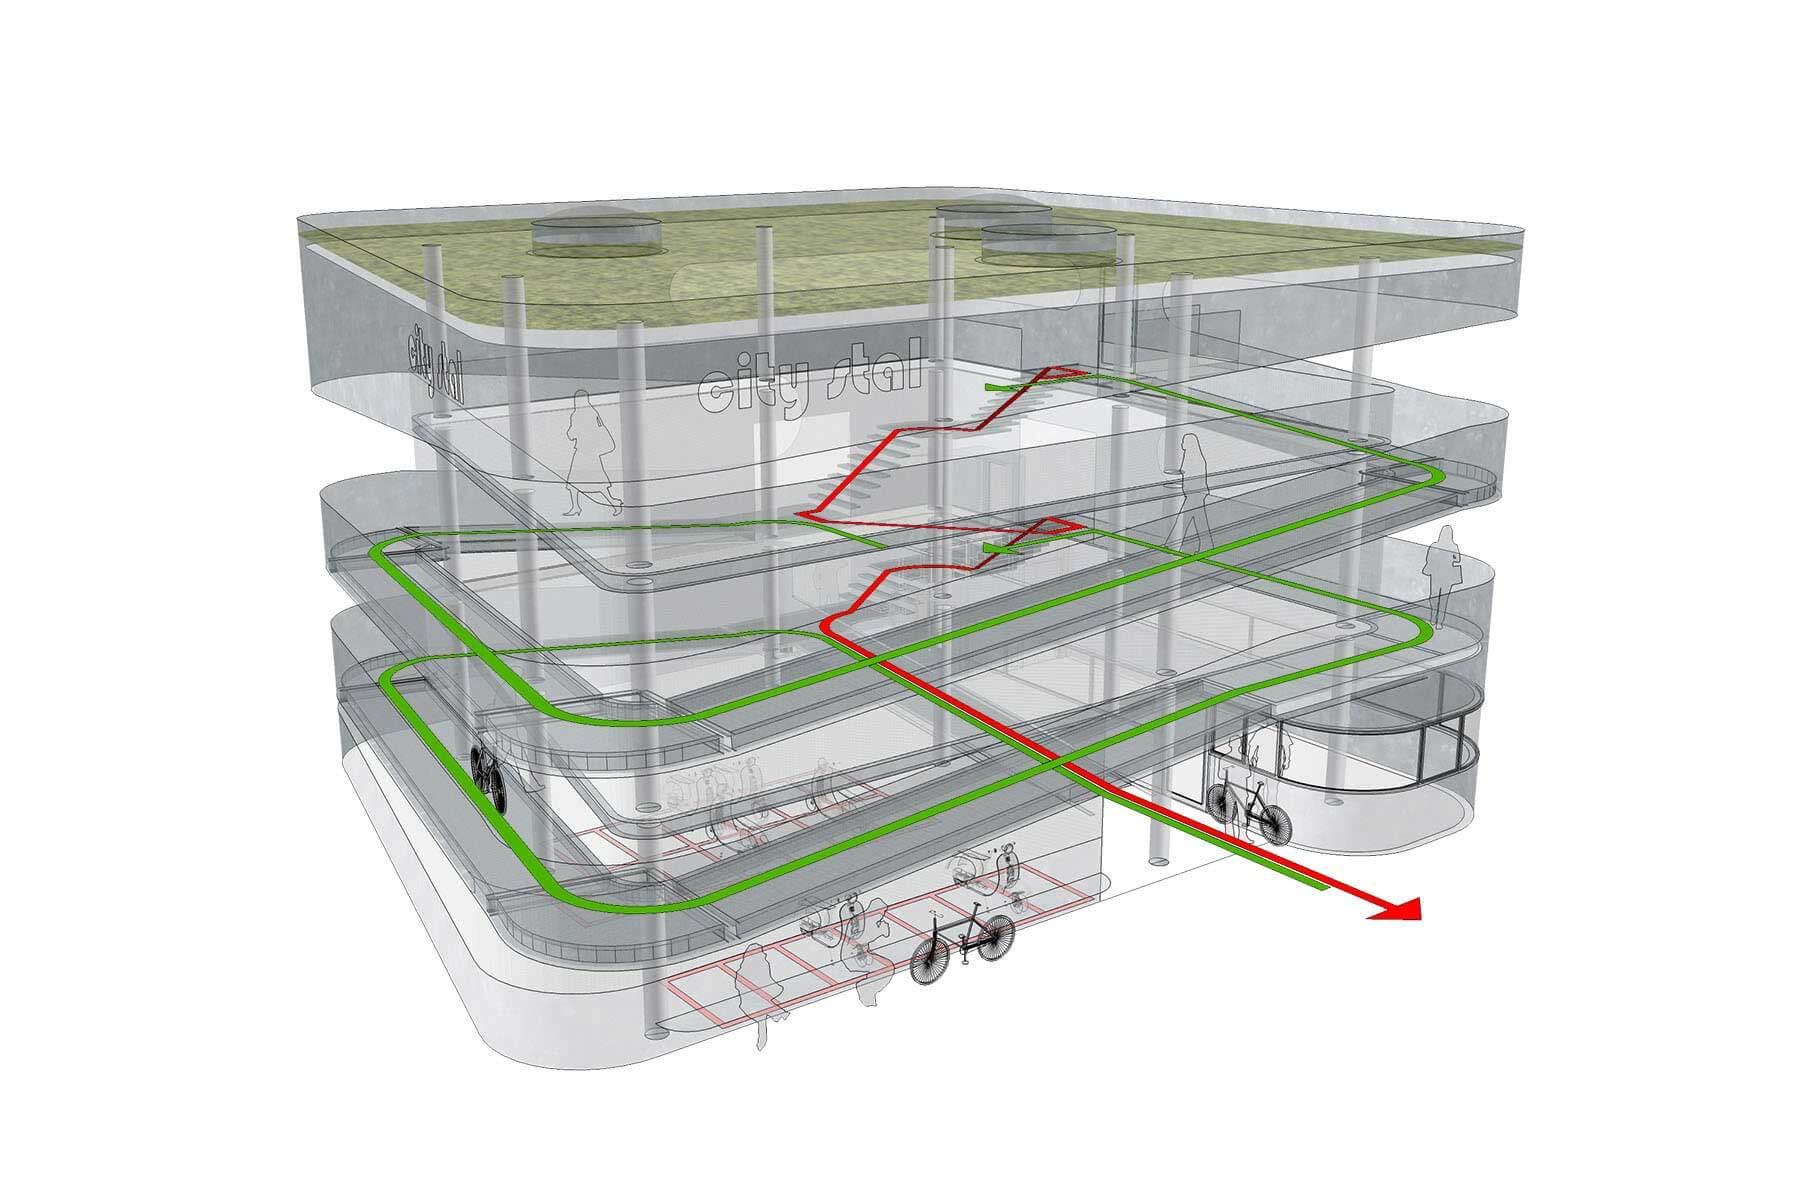 8A-Architecten-city-stal-nieuwegein-05